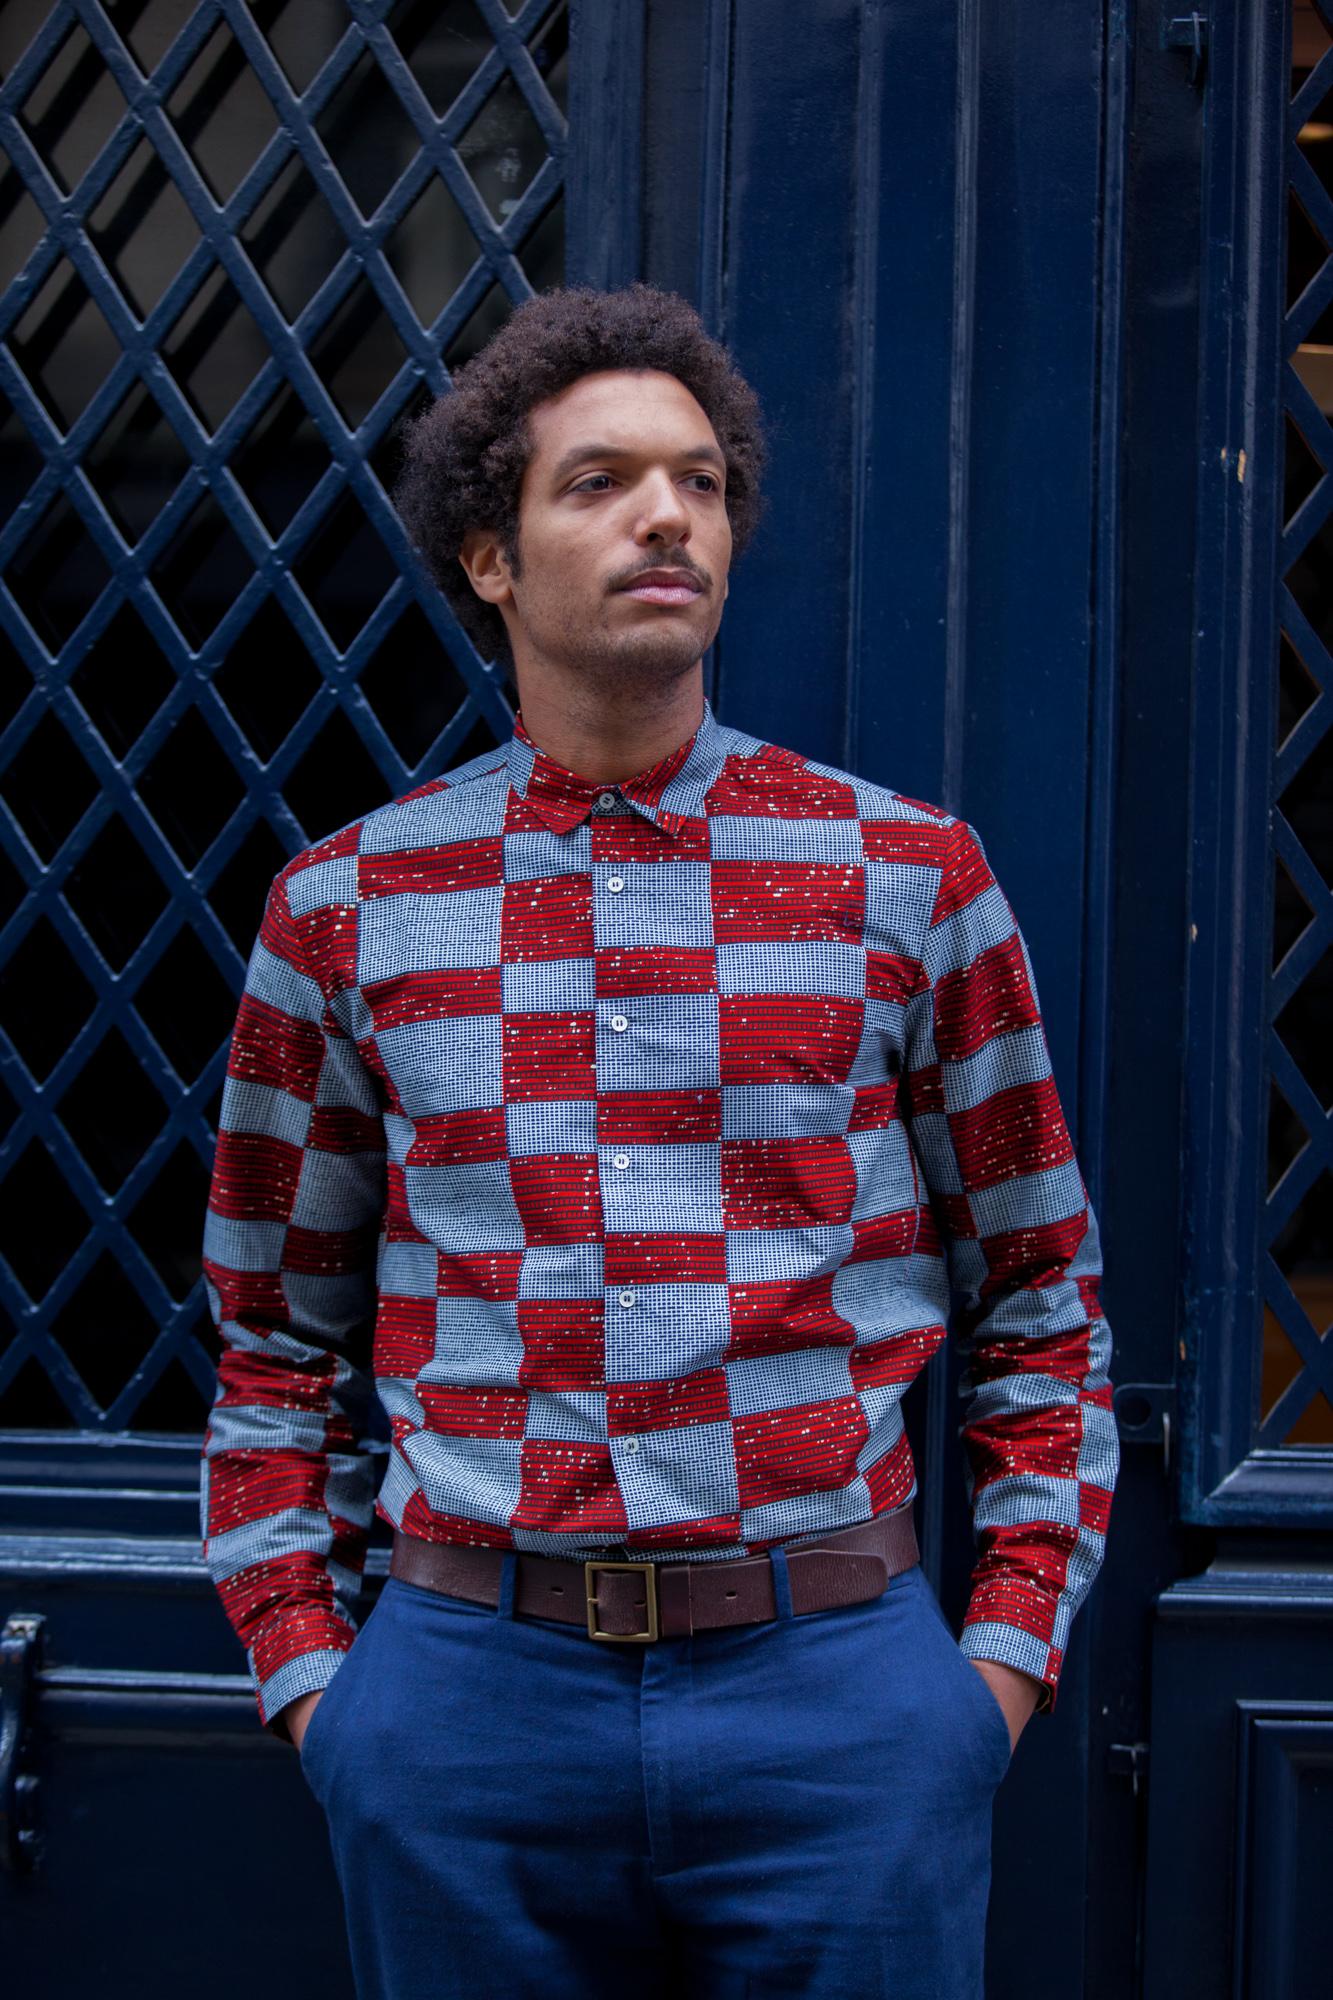 Pierre Damier Wax Shirt Worn By Jean Collection Vivi Moonlook